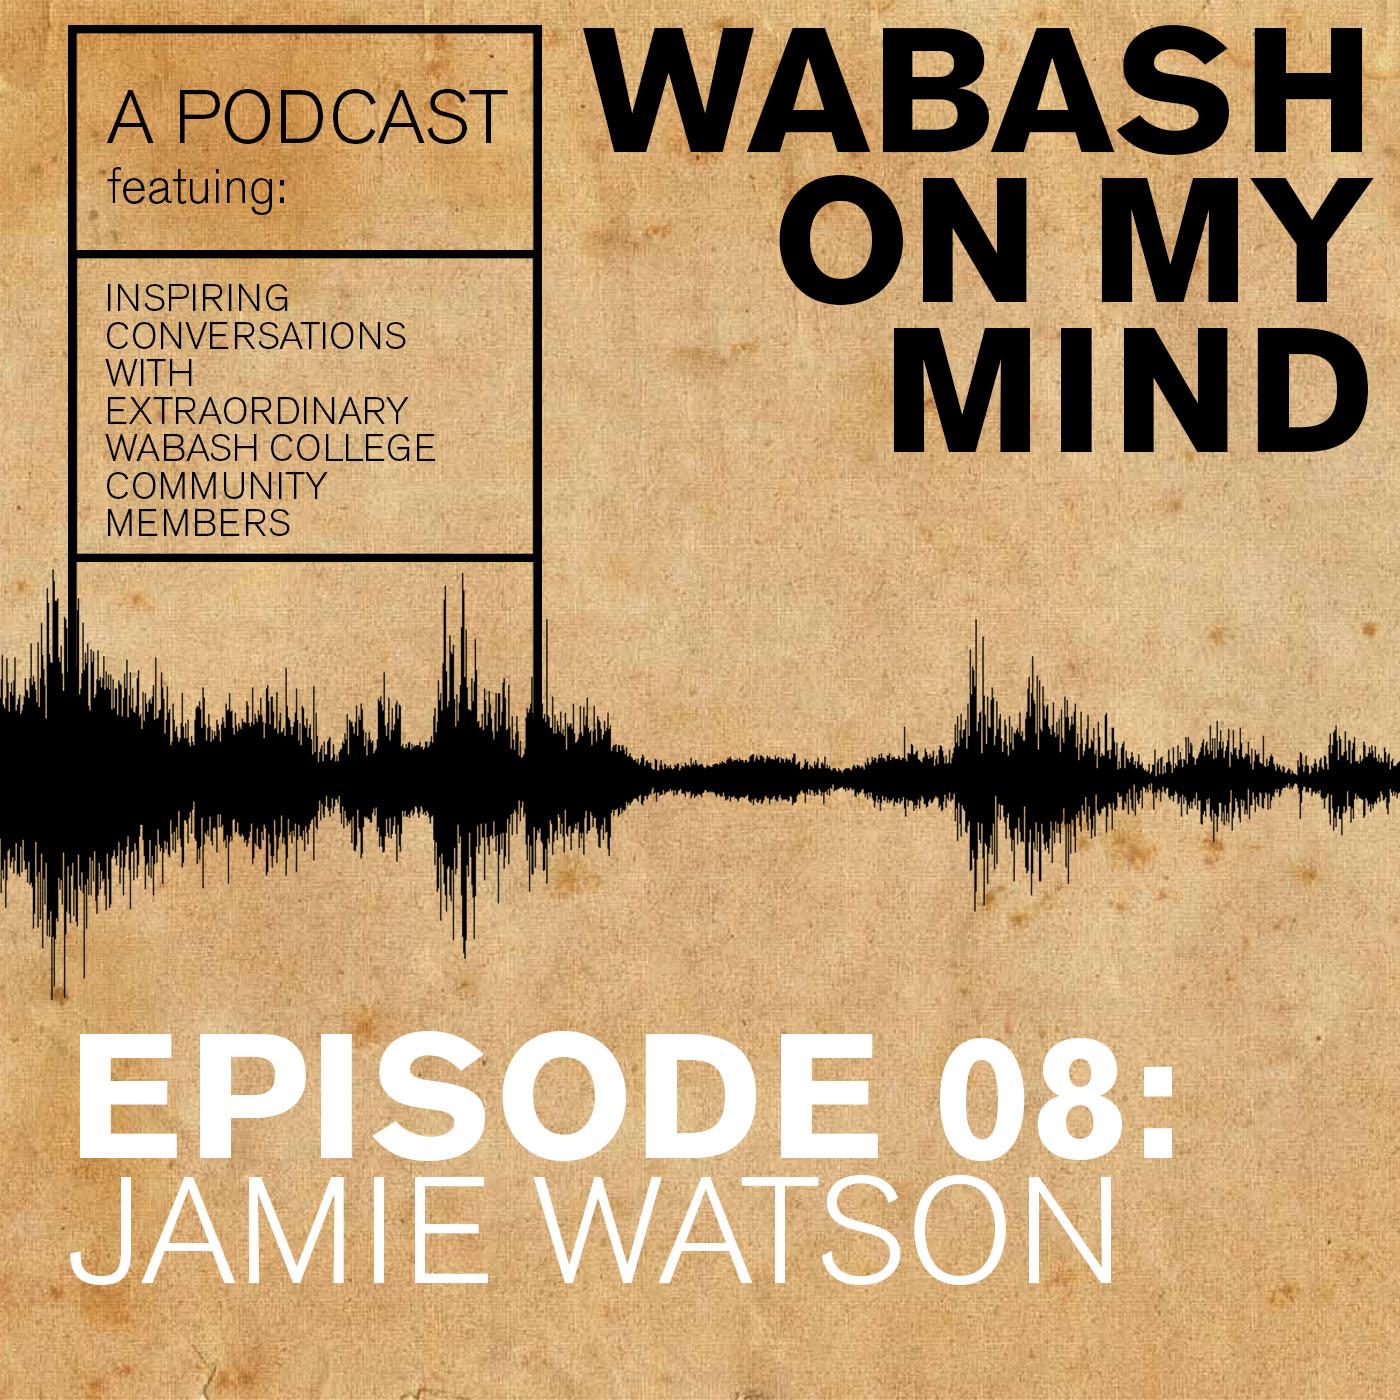 Jamie Watson